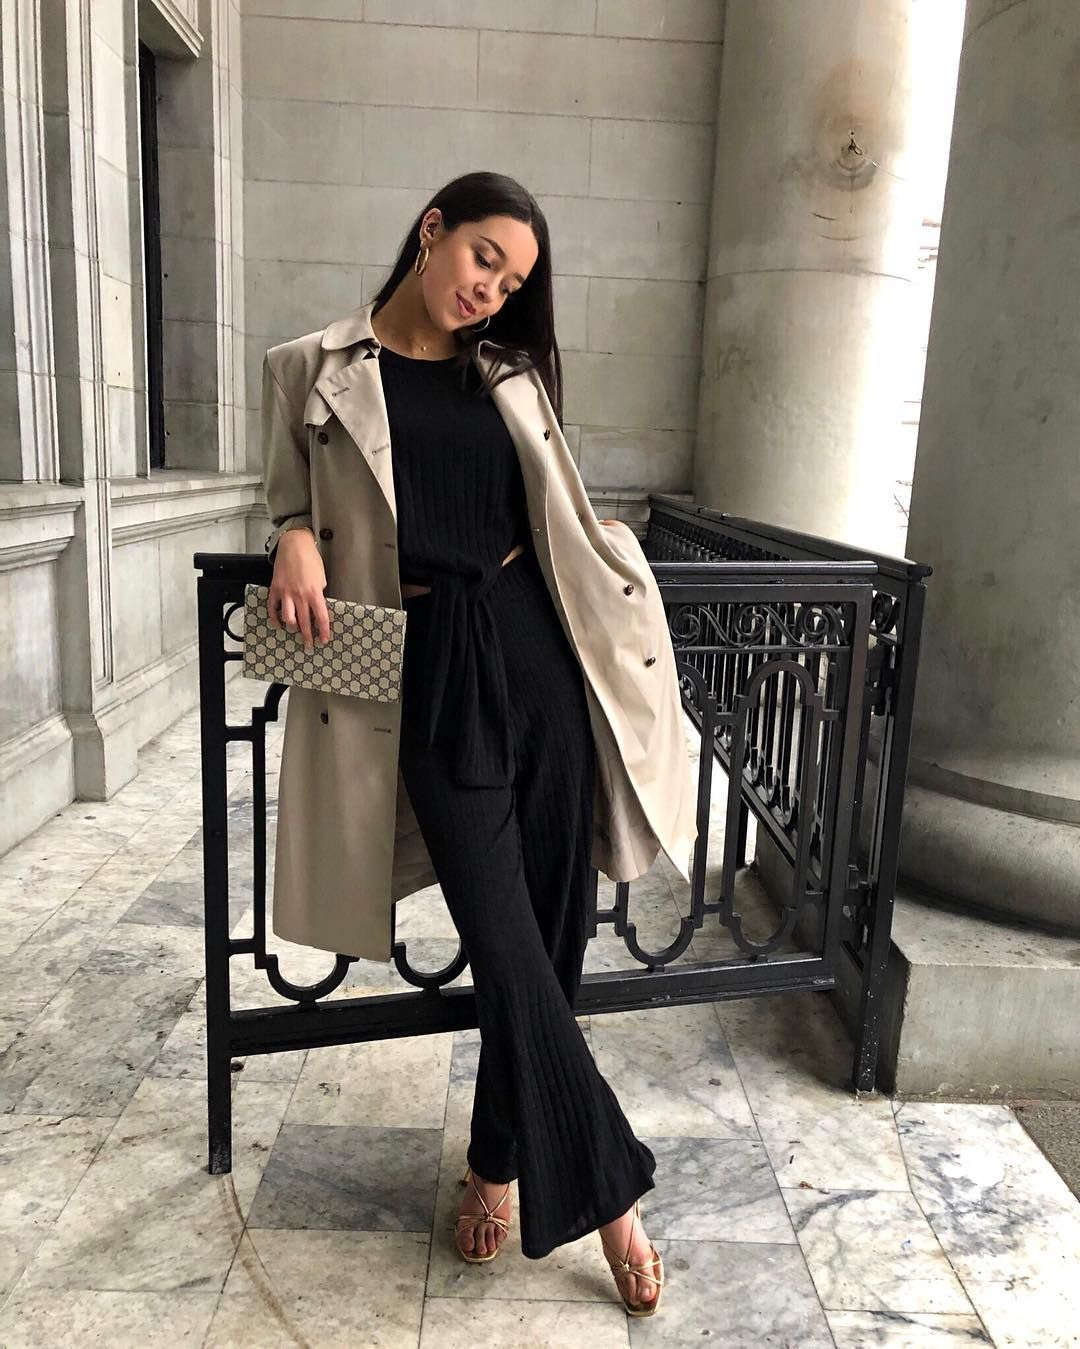 Zarayna F  (@zaraynaf) • Instagram photos and videos